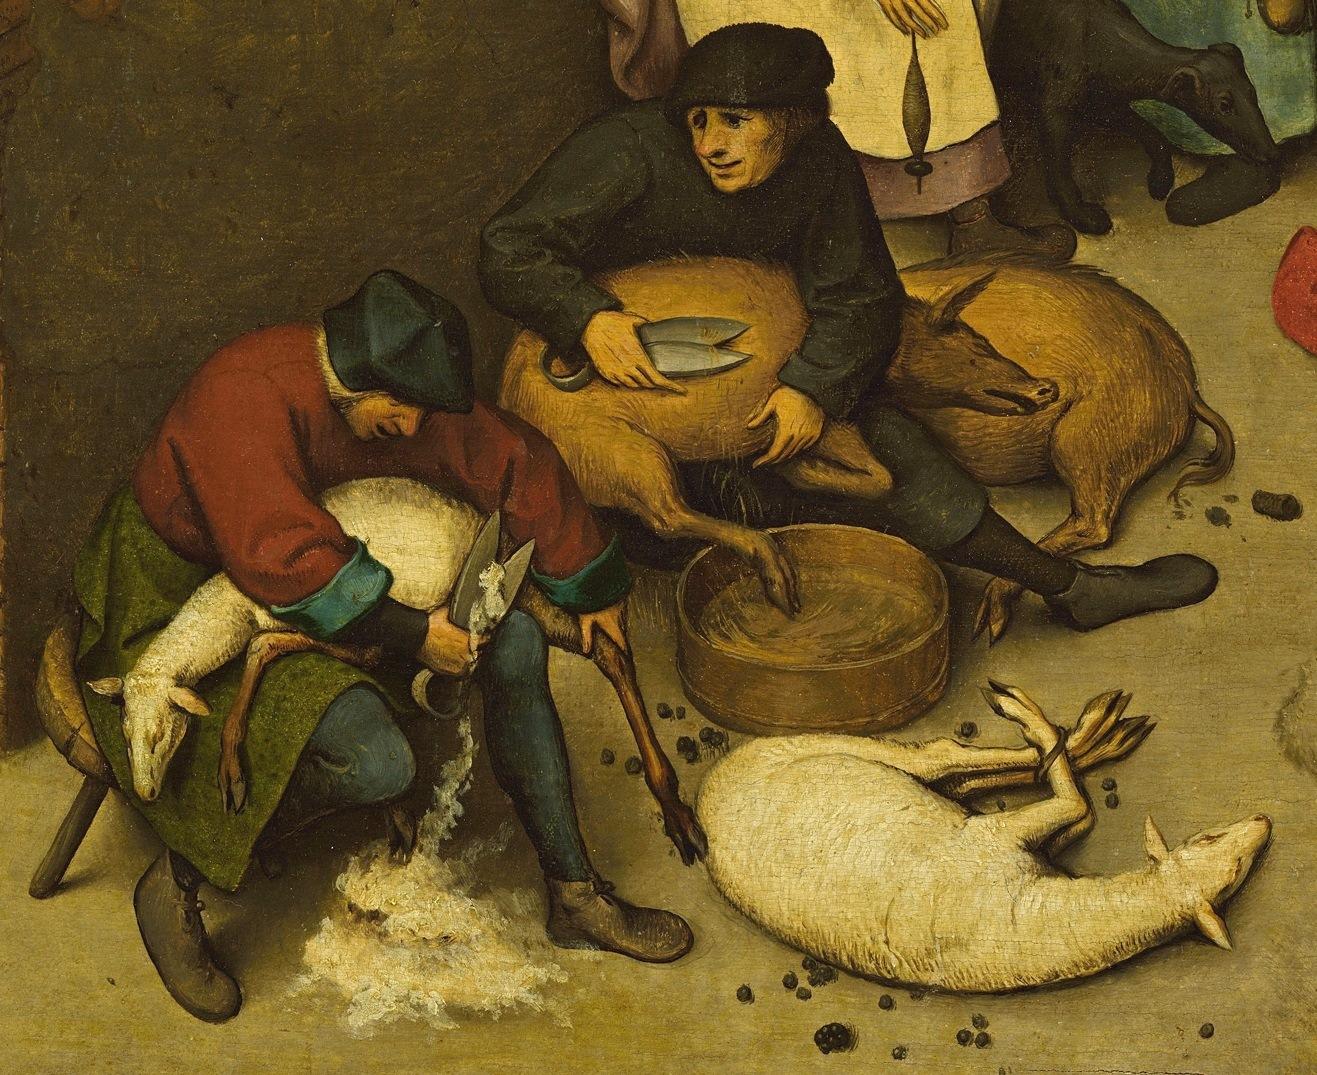 brueghel-proverbs-042.jpg